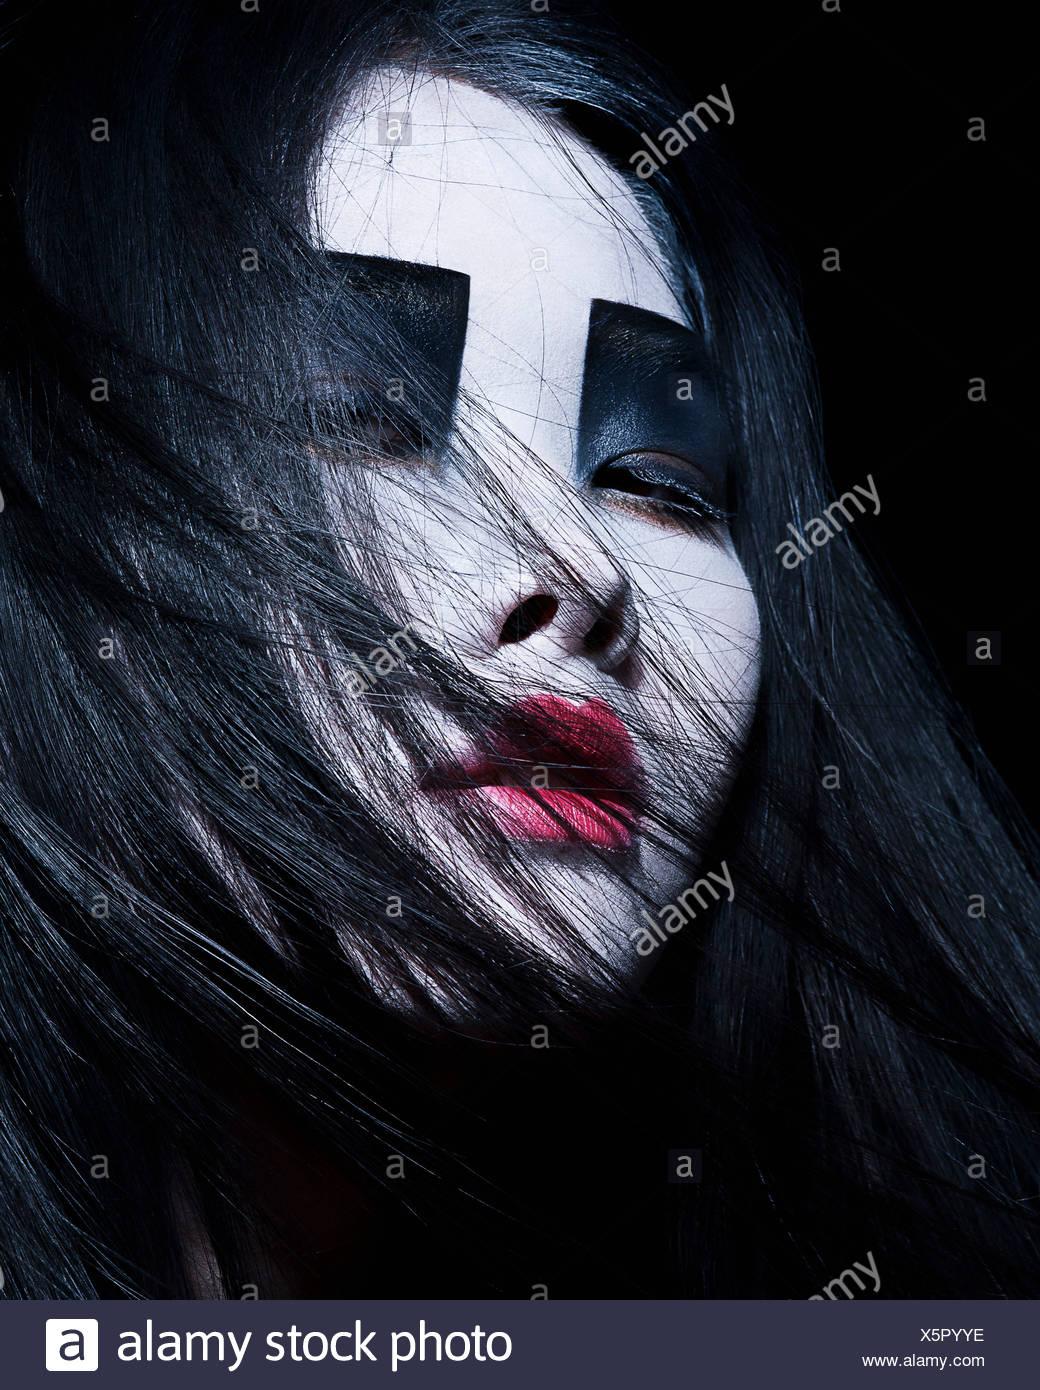 Young woman with dramatic makeup, black eyeshadow - Stock Image